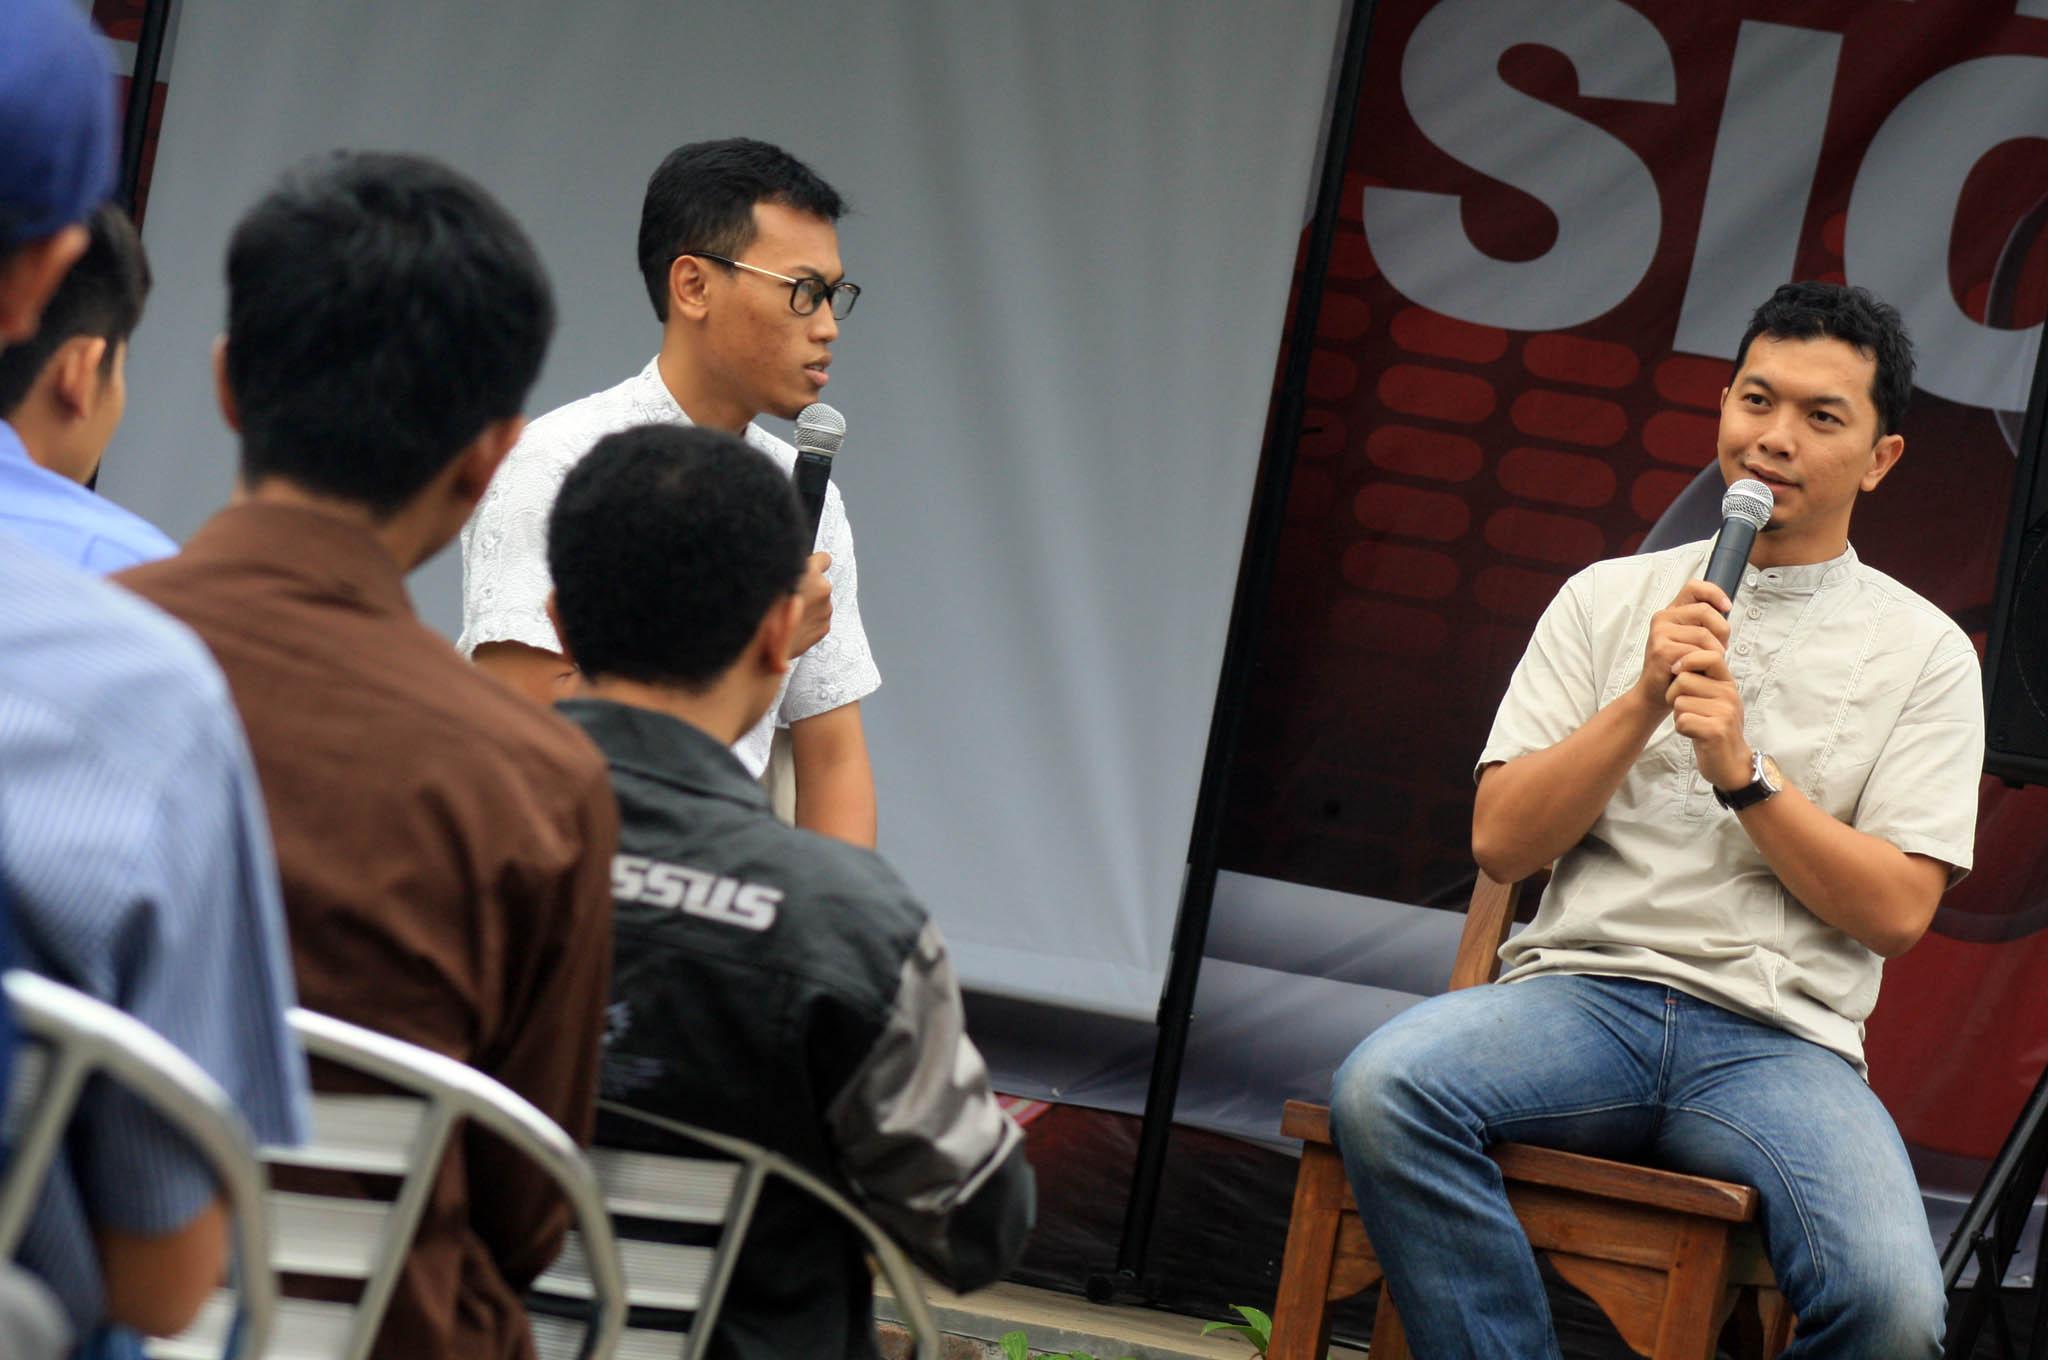 20130722_TAUFIK JOB UIN_BDG_Talk Show Attitude Enterpreneur Tangguh_01